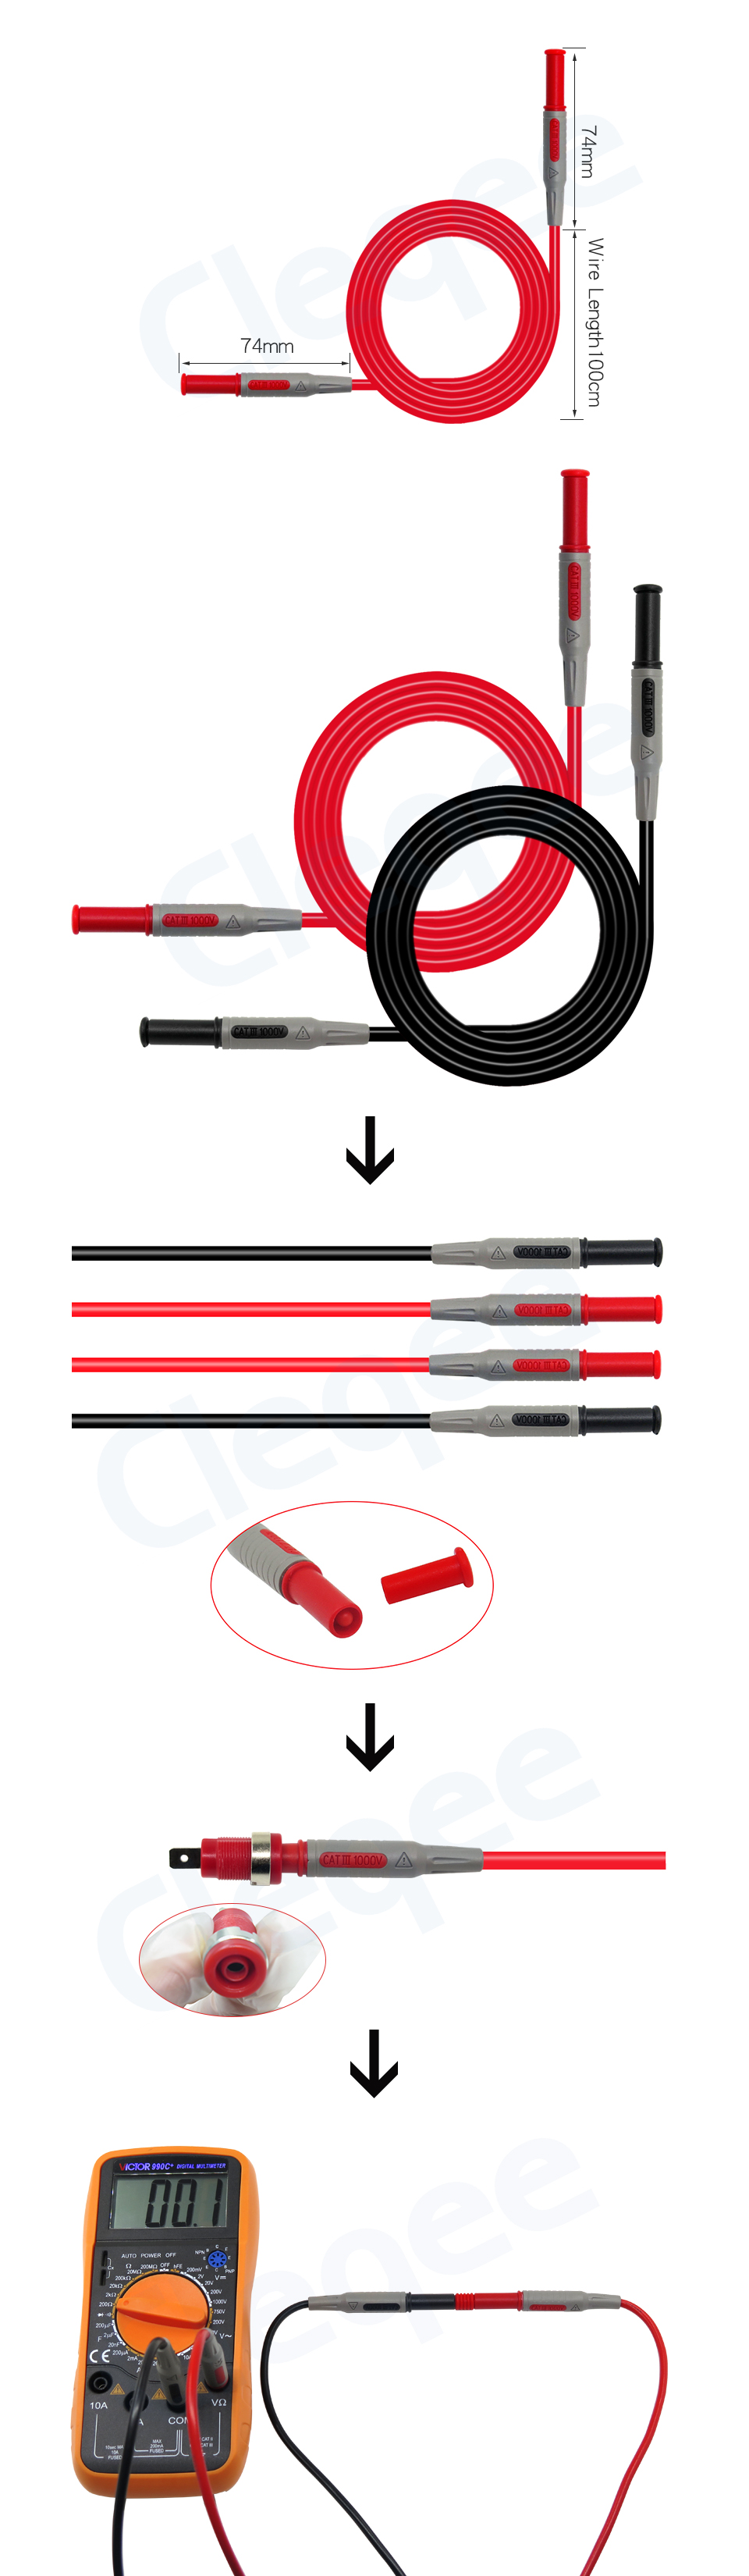 P5006 2X Banana Socket Plug Test Lead Single Hook Clip For Electric Testing